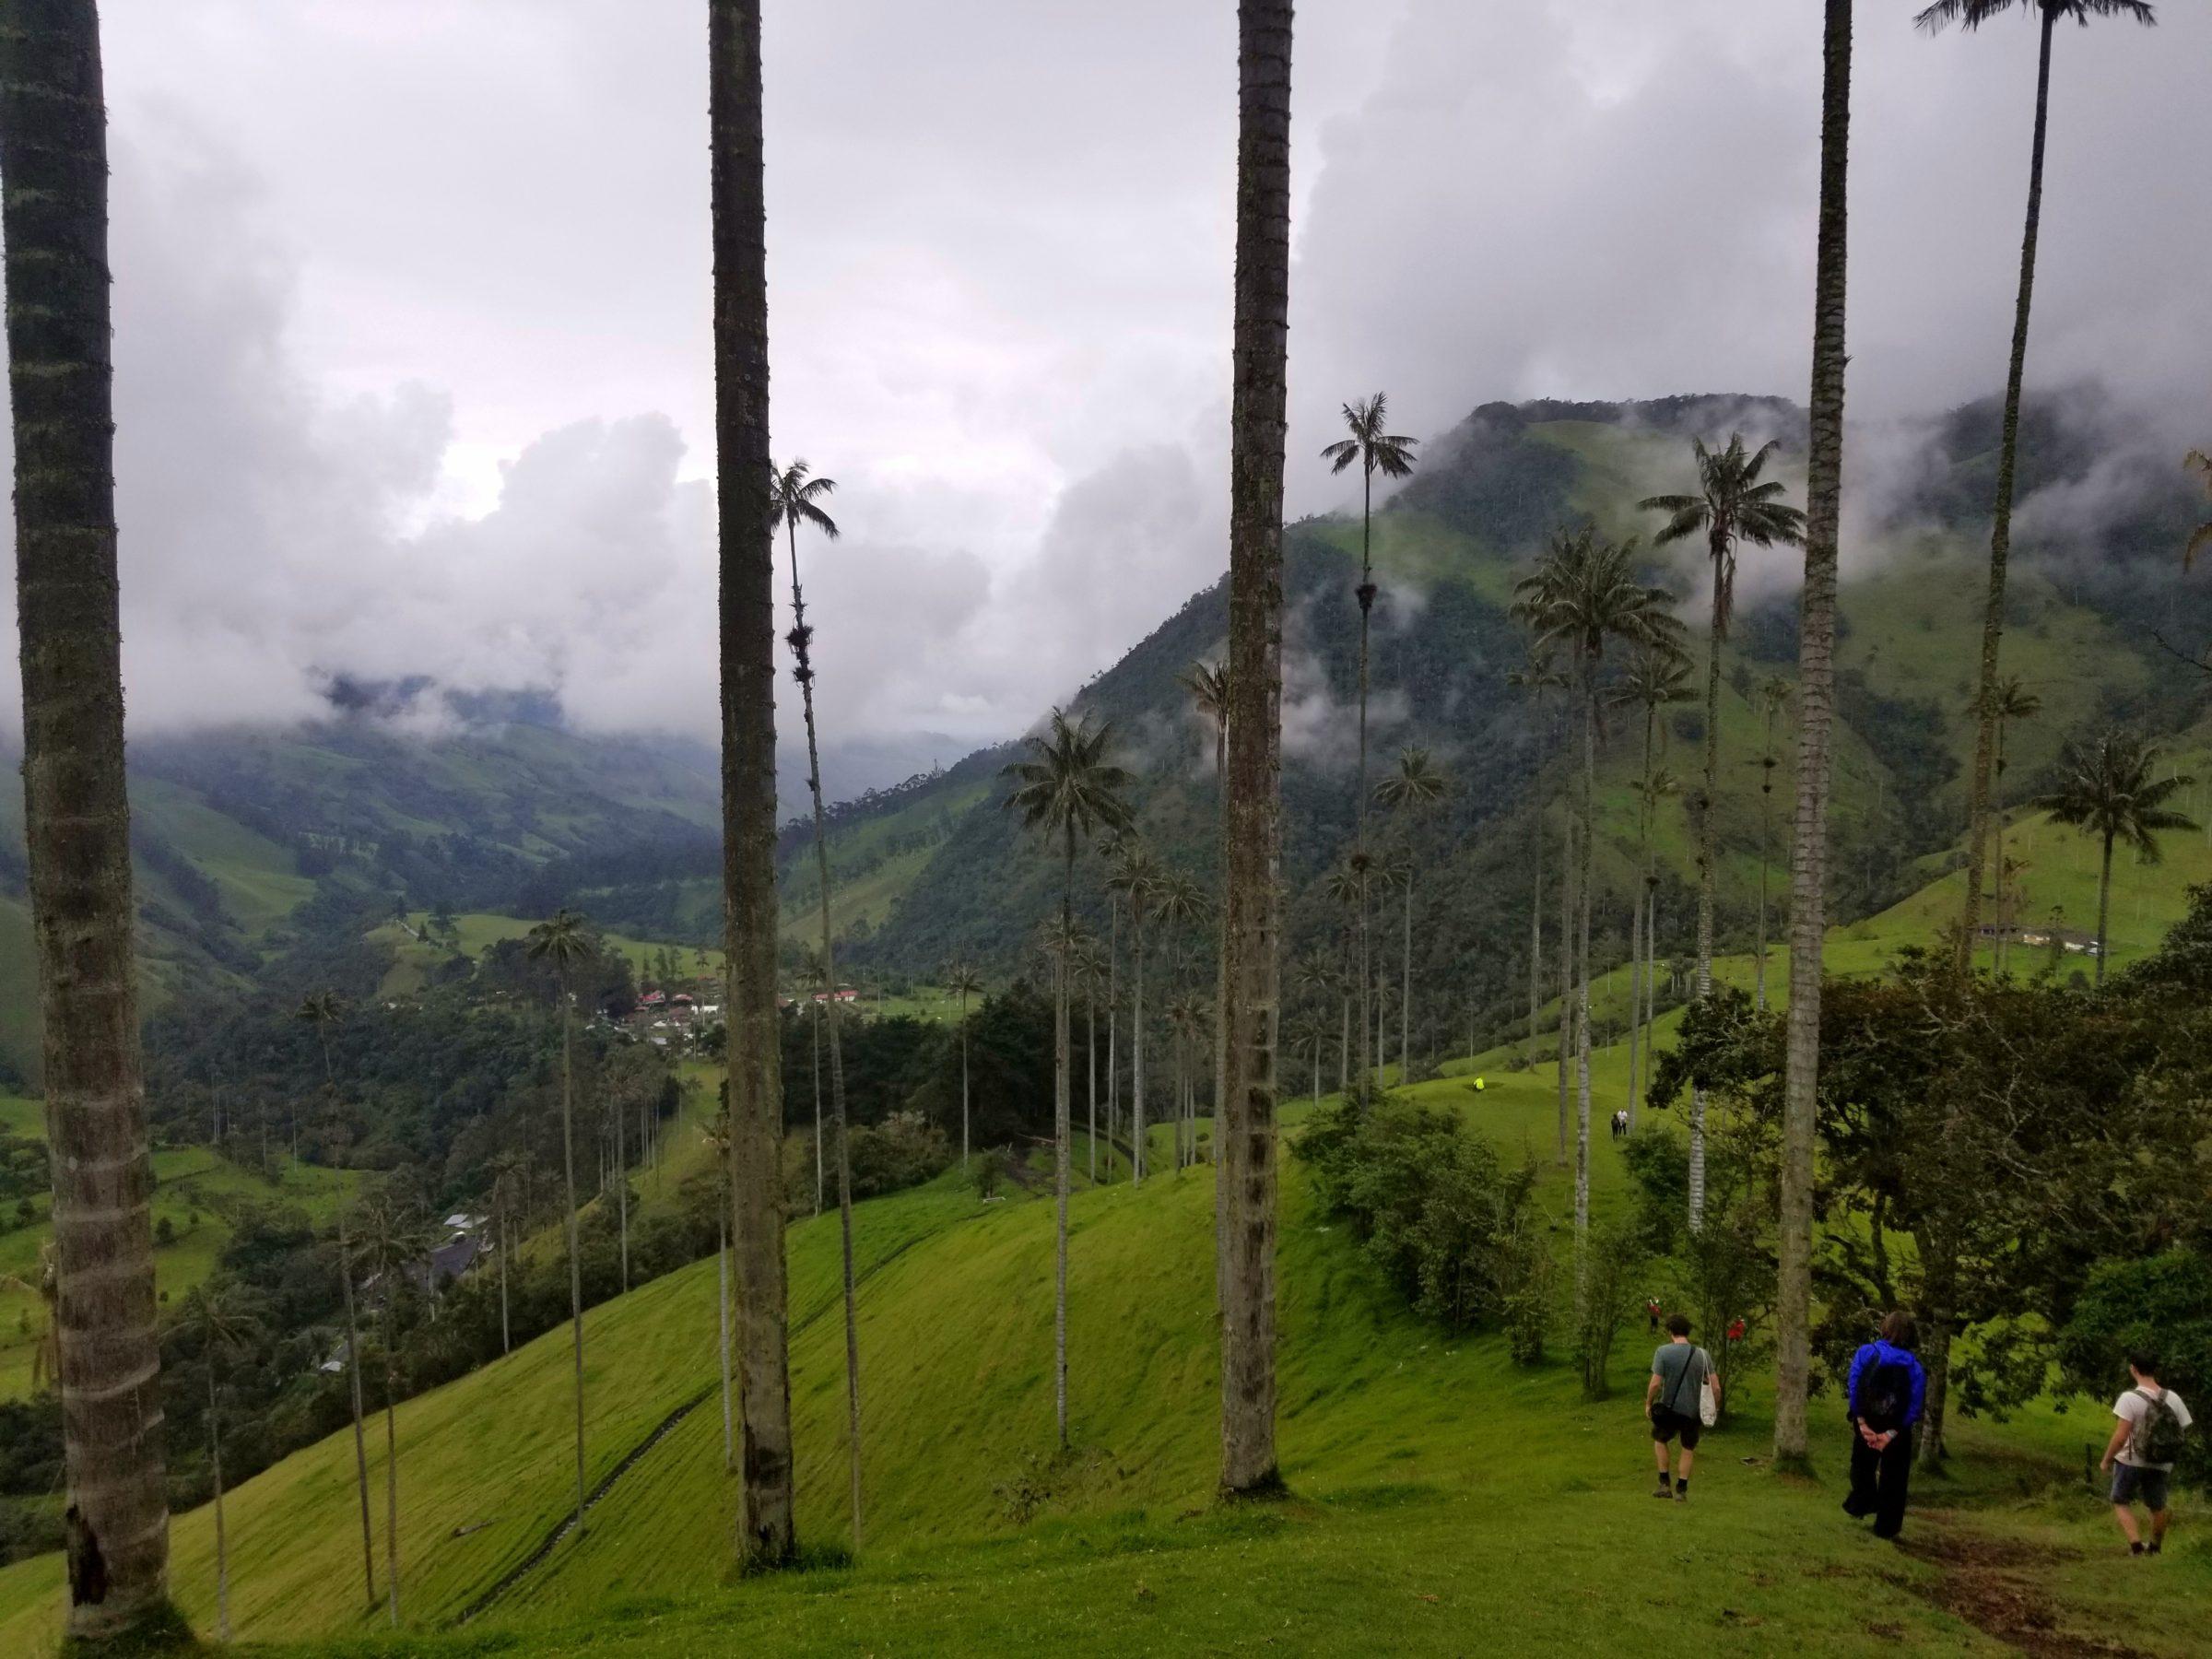 Hiking down through Valle de Cocora